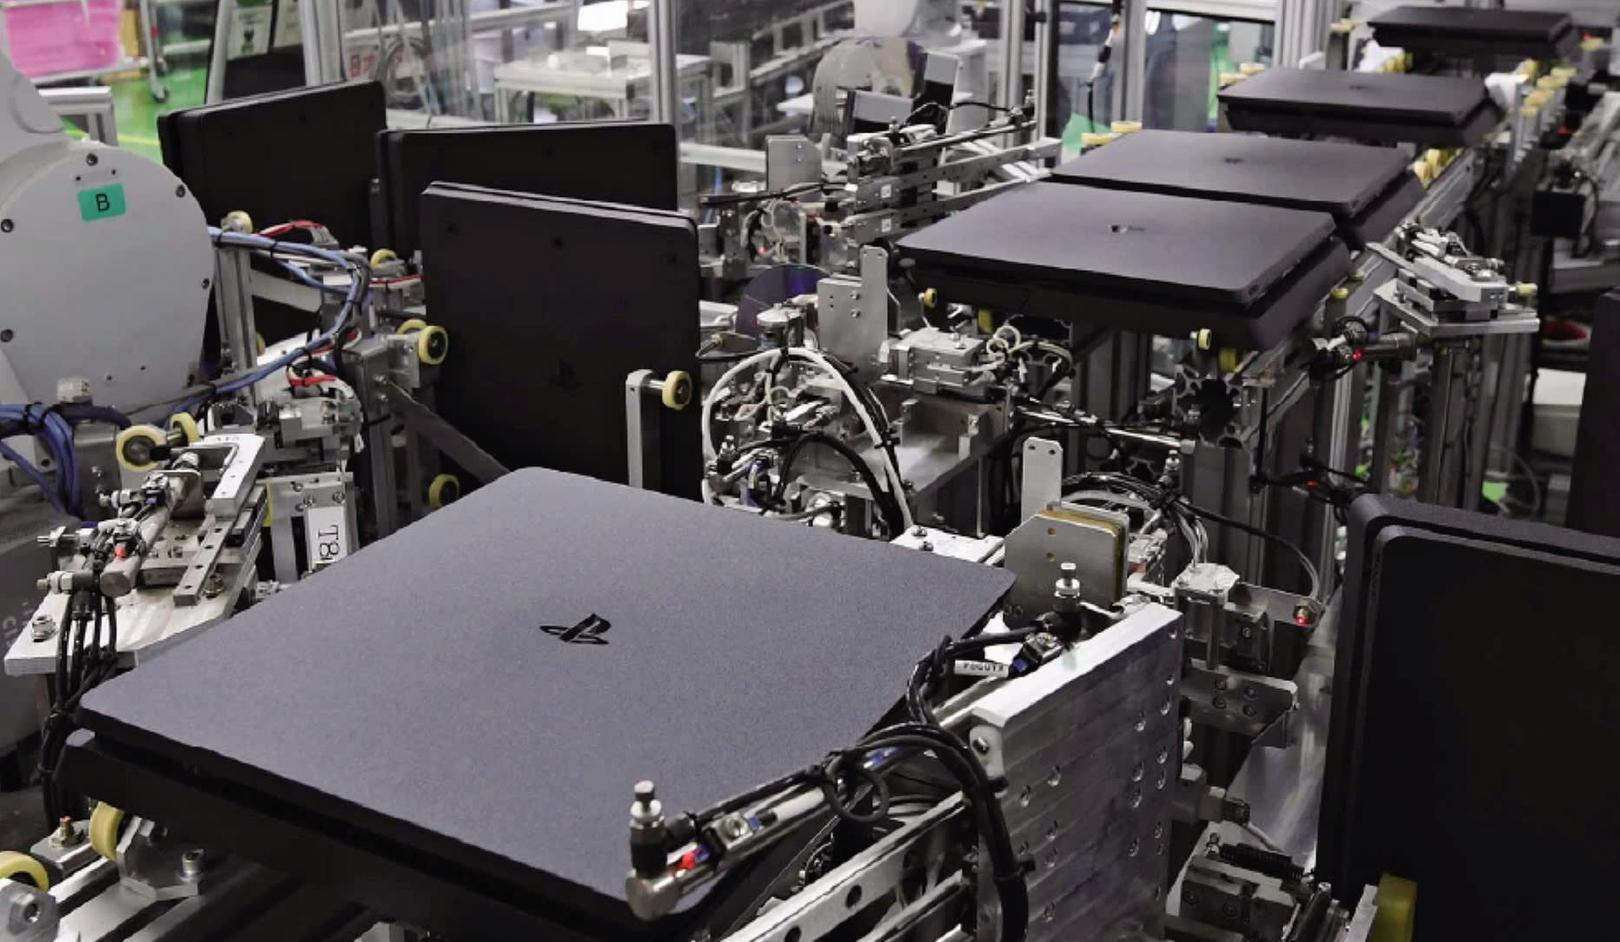 Завод Sony производит одну консоль PS4 каждые 30 секунд